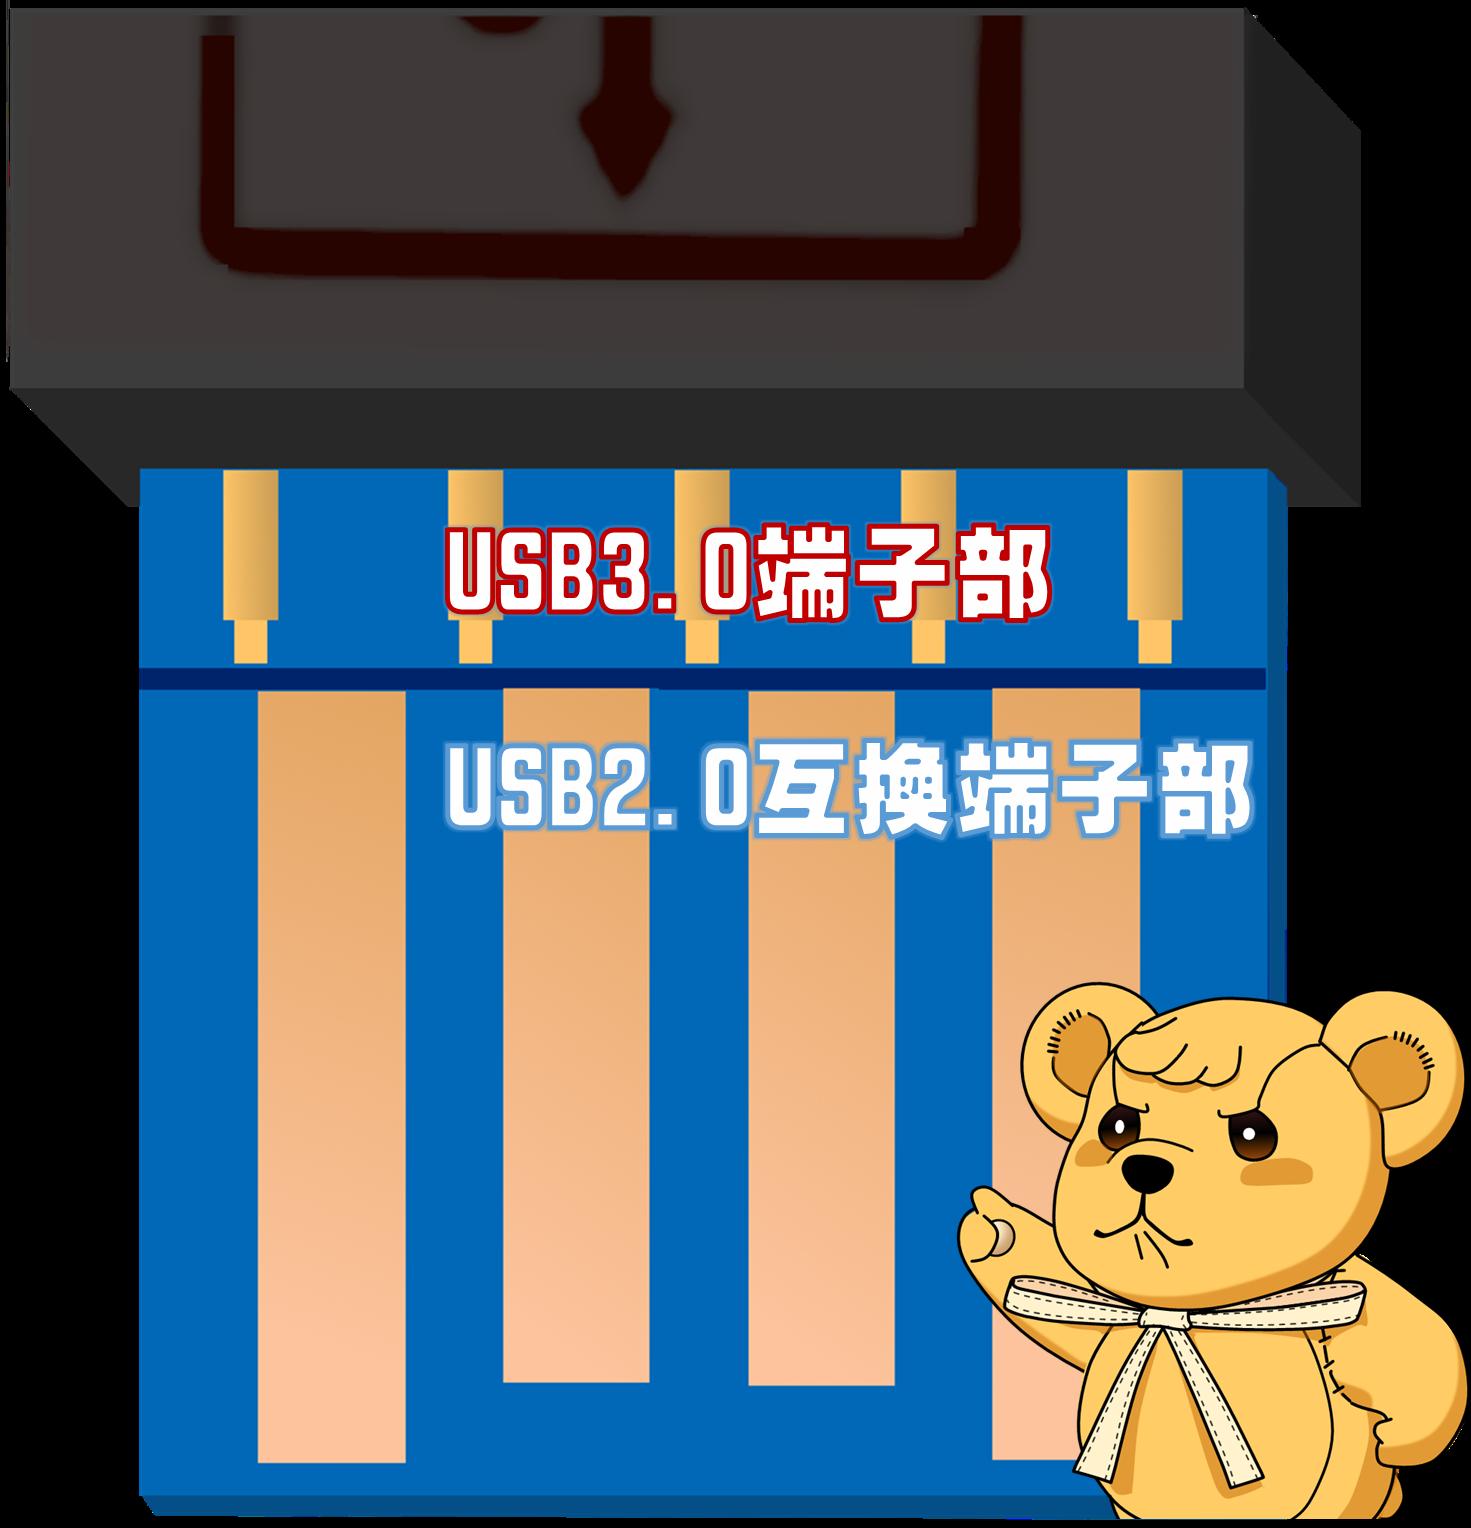 USB3.0がUSB2.0として認識される仕組み図解